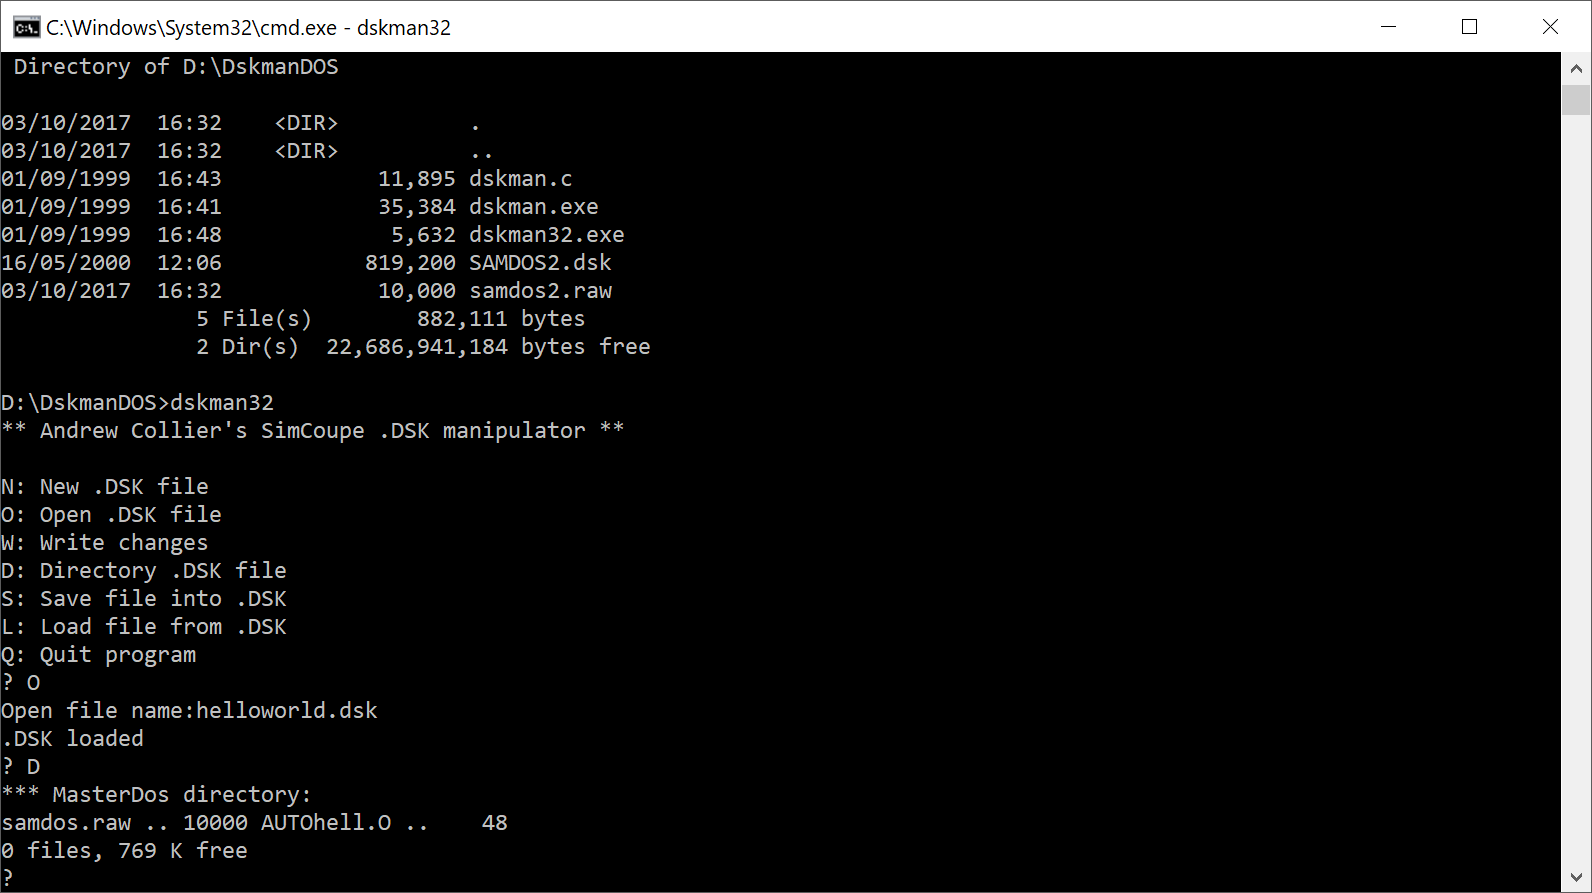 Assembly Code Tools - DiskmanDOS - Full Disk